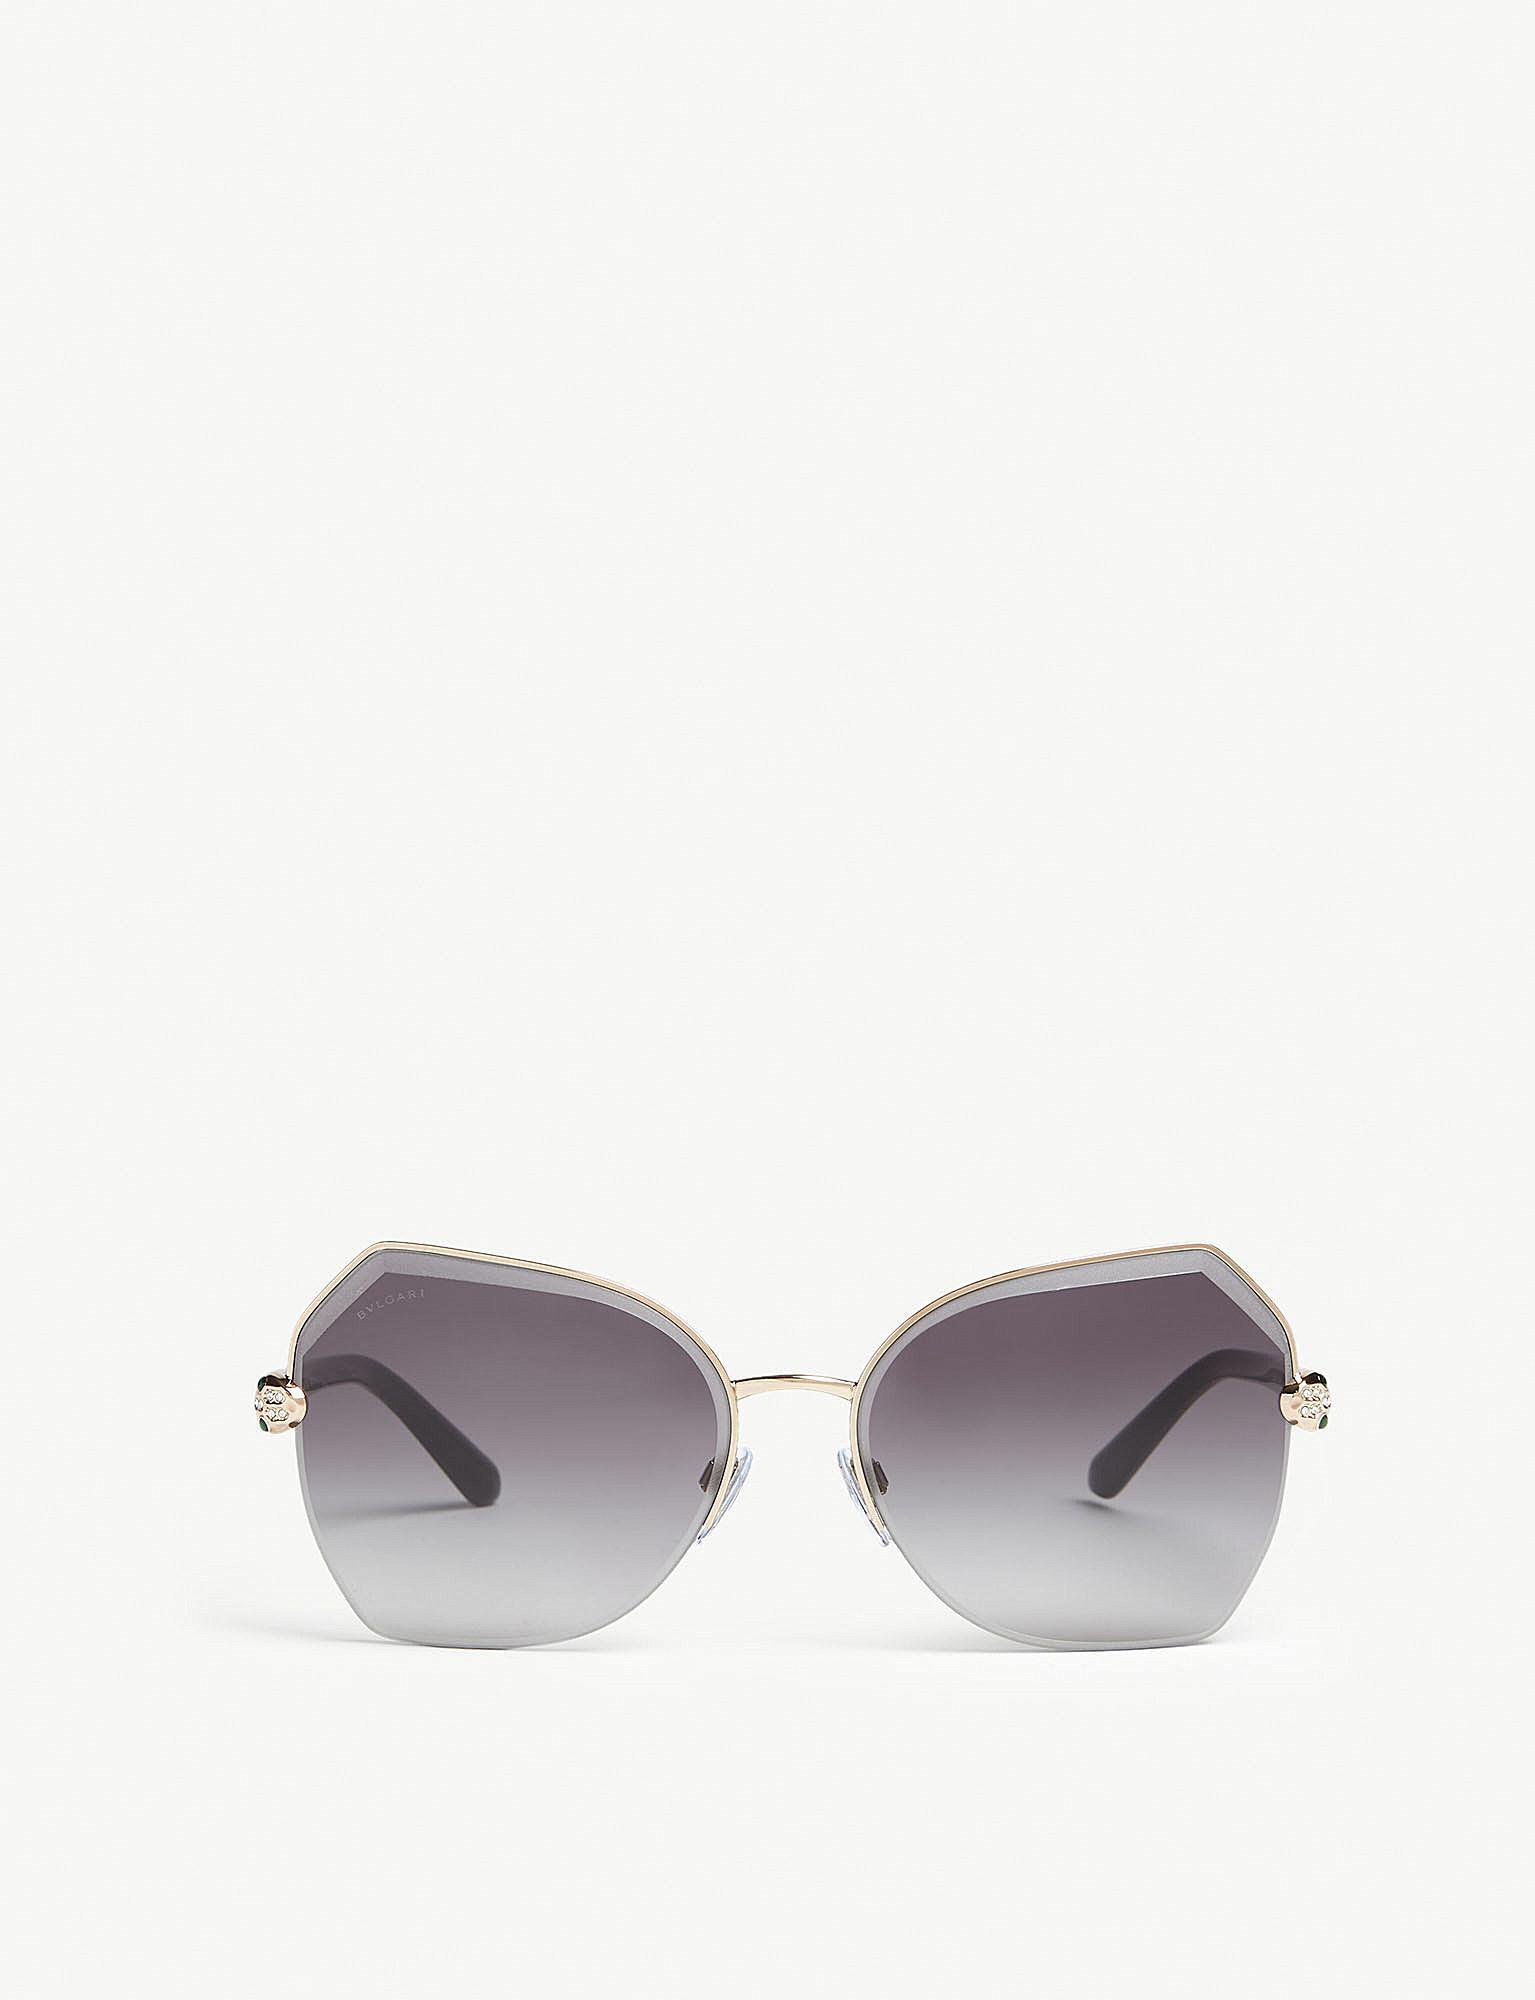 a0a0ee8f32a1 BVLGARI - Metallic Ladies Gold Luxury Bv6102b Irregular-frame Sunglasses -  Lyst. View fullscreen